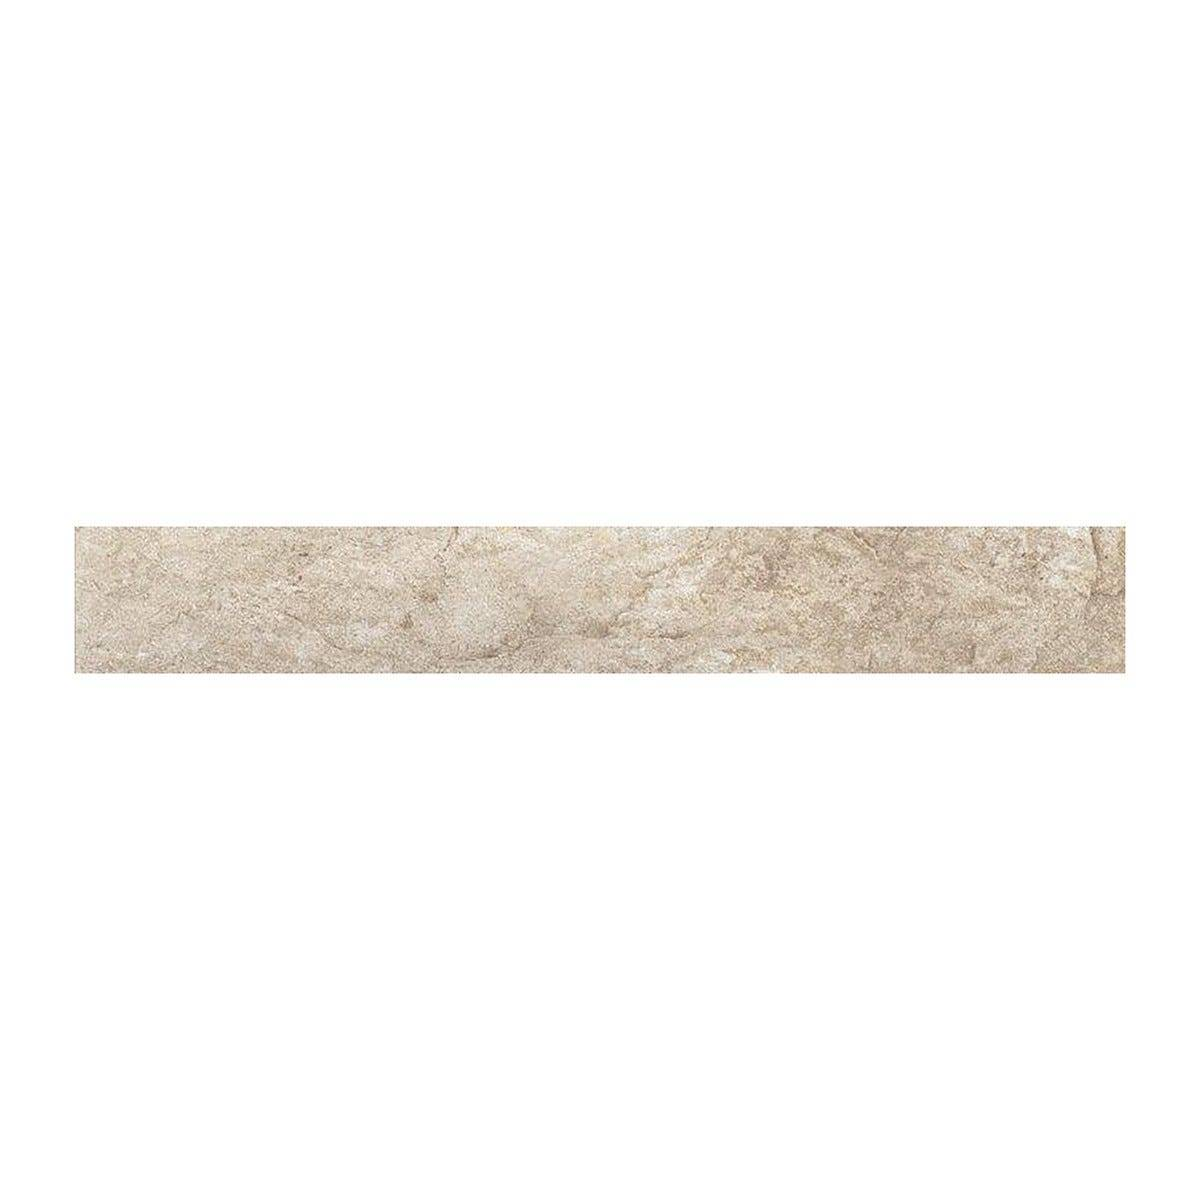 Battiscopa Pietra Panna 7,5x60x0,8 Cm 10 Pezzi Pei3 Gres Porcellanato